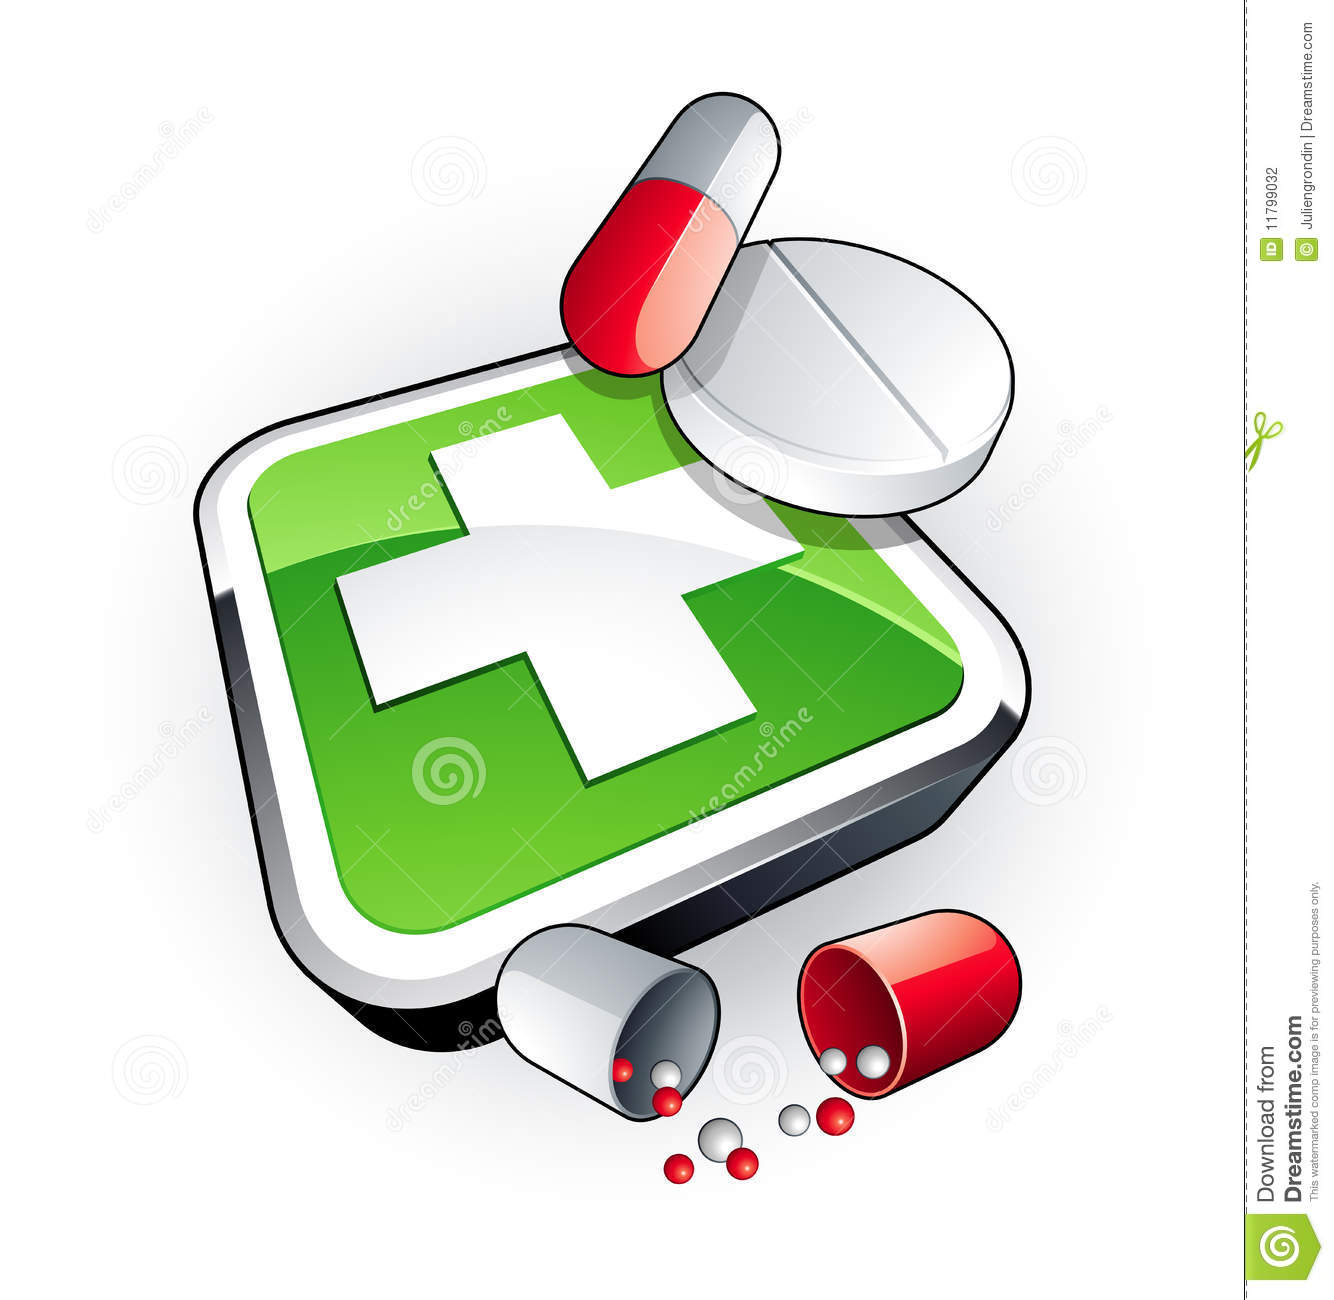 Medicinal clipart Images Free Panda Free Clipart